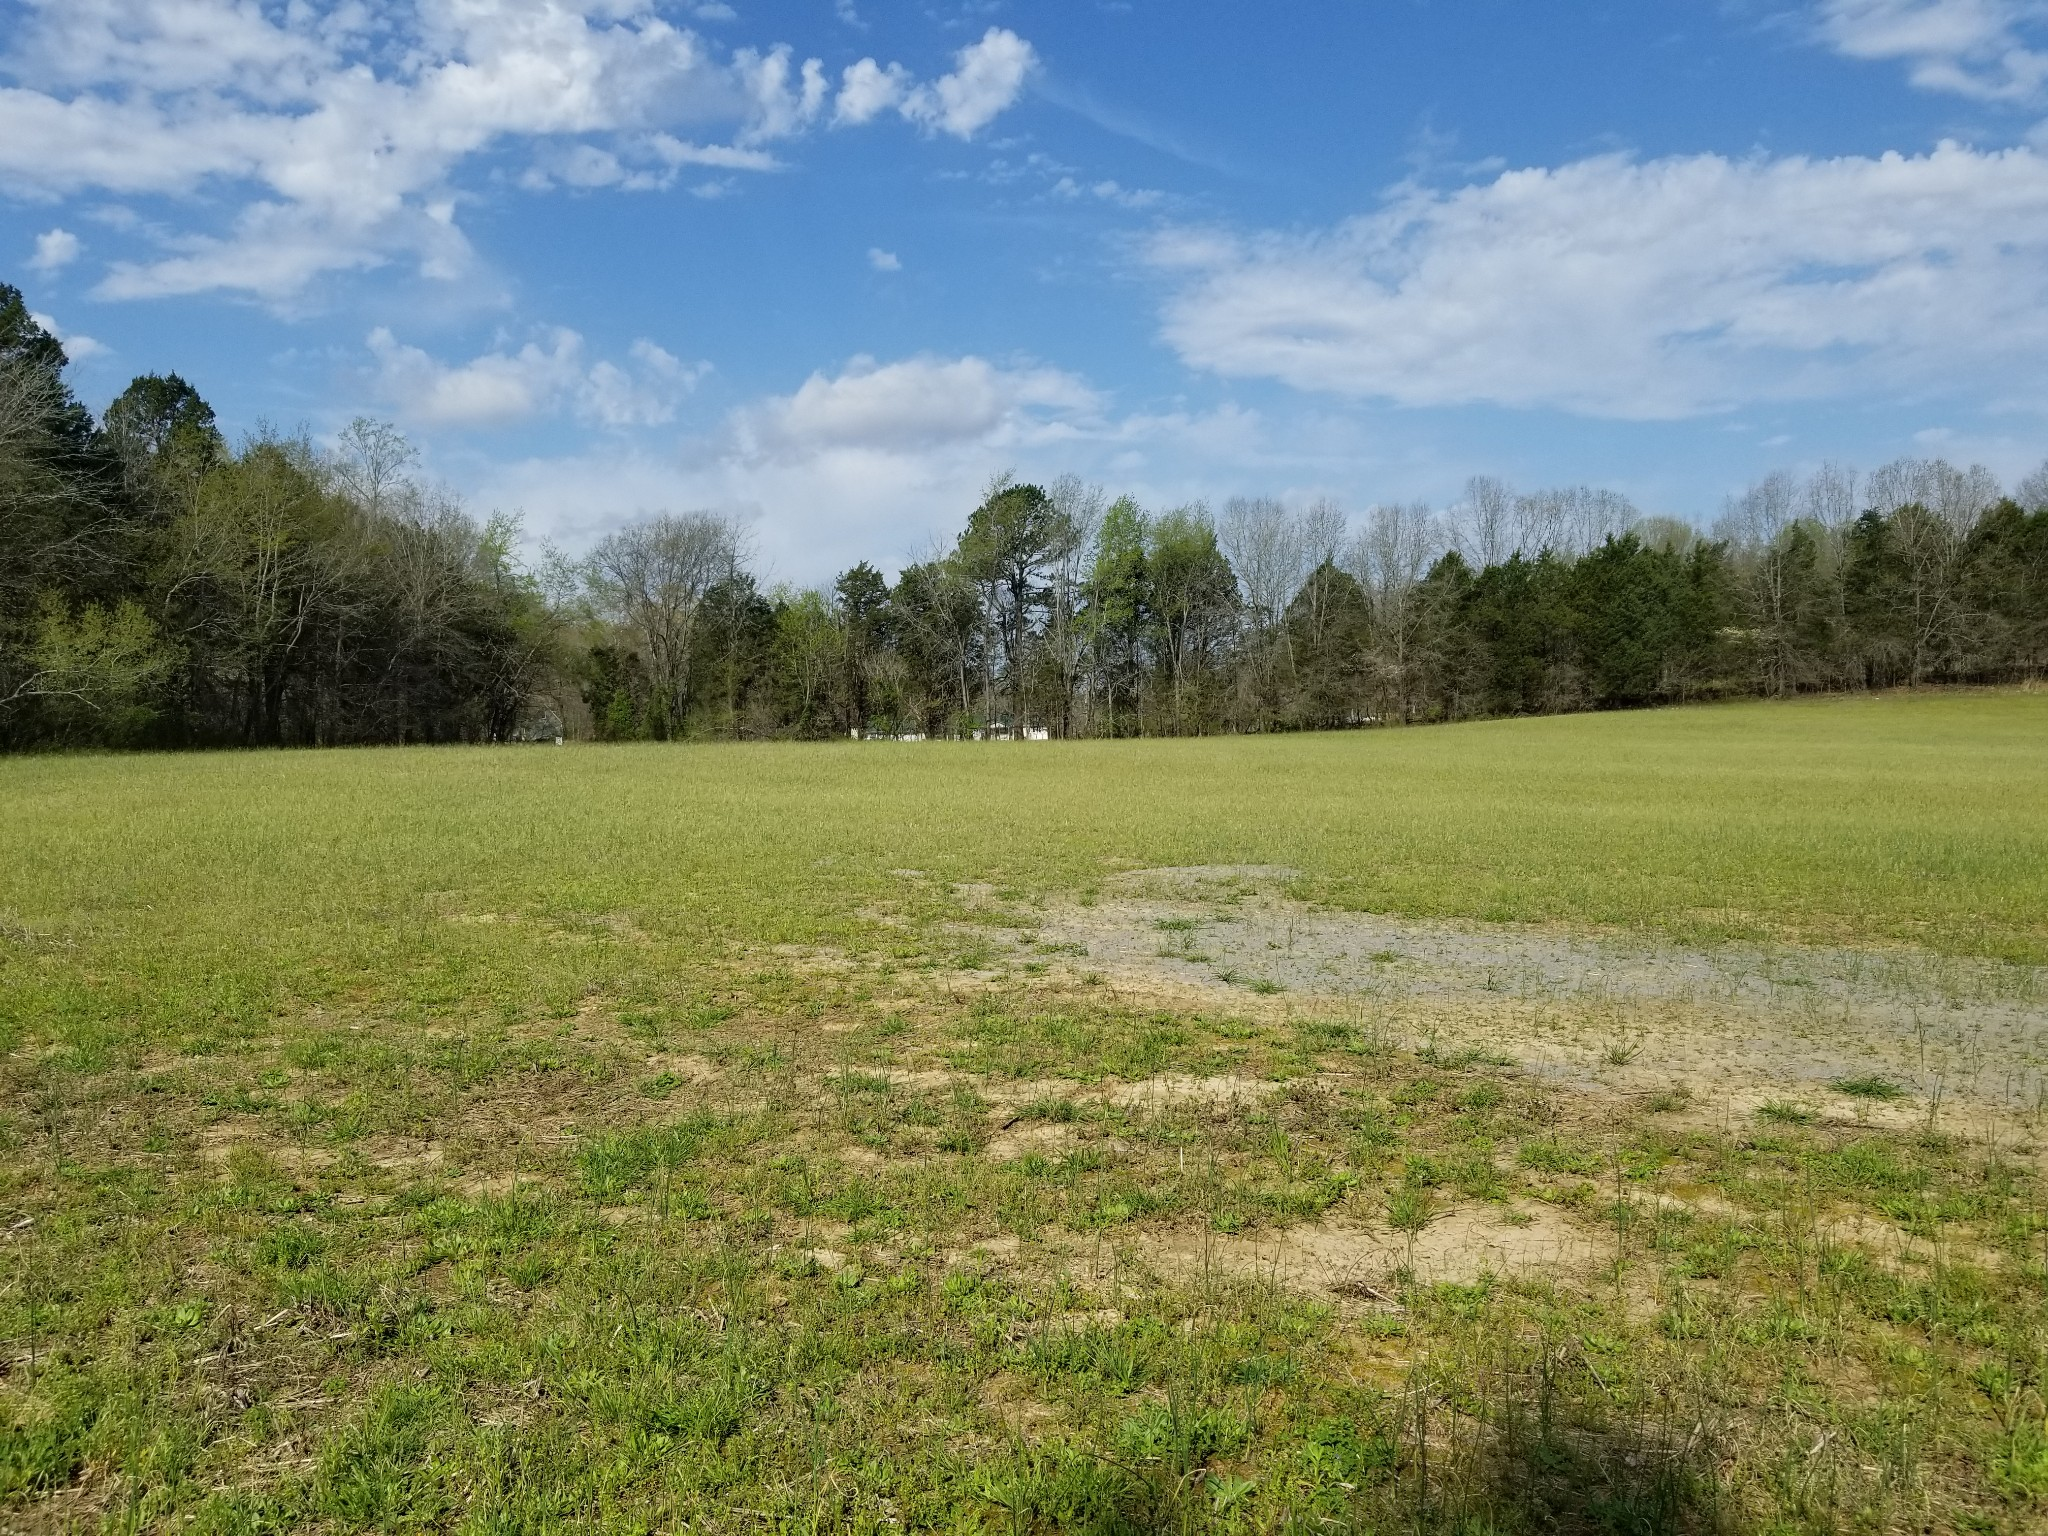 989 Britton Springs Rd, Clarksville, TN 37042 - Clarksville, TN real estate listing